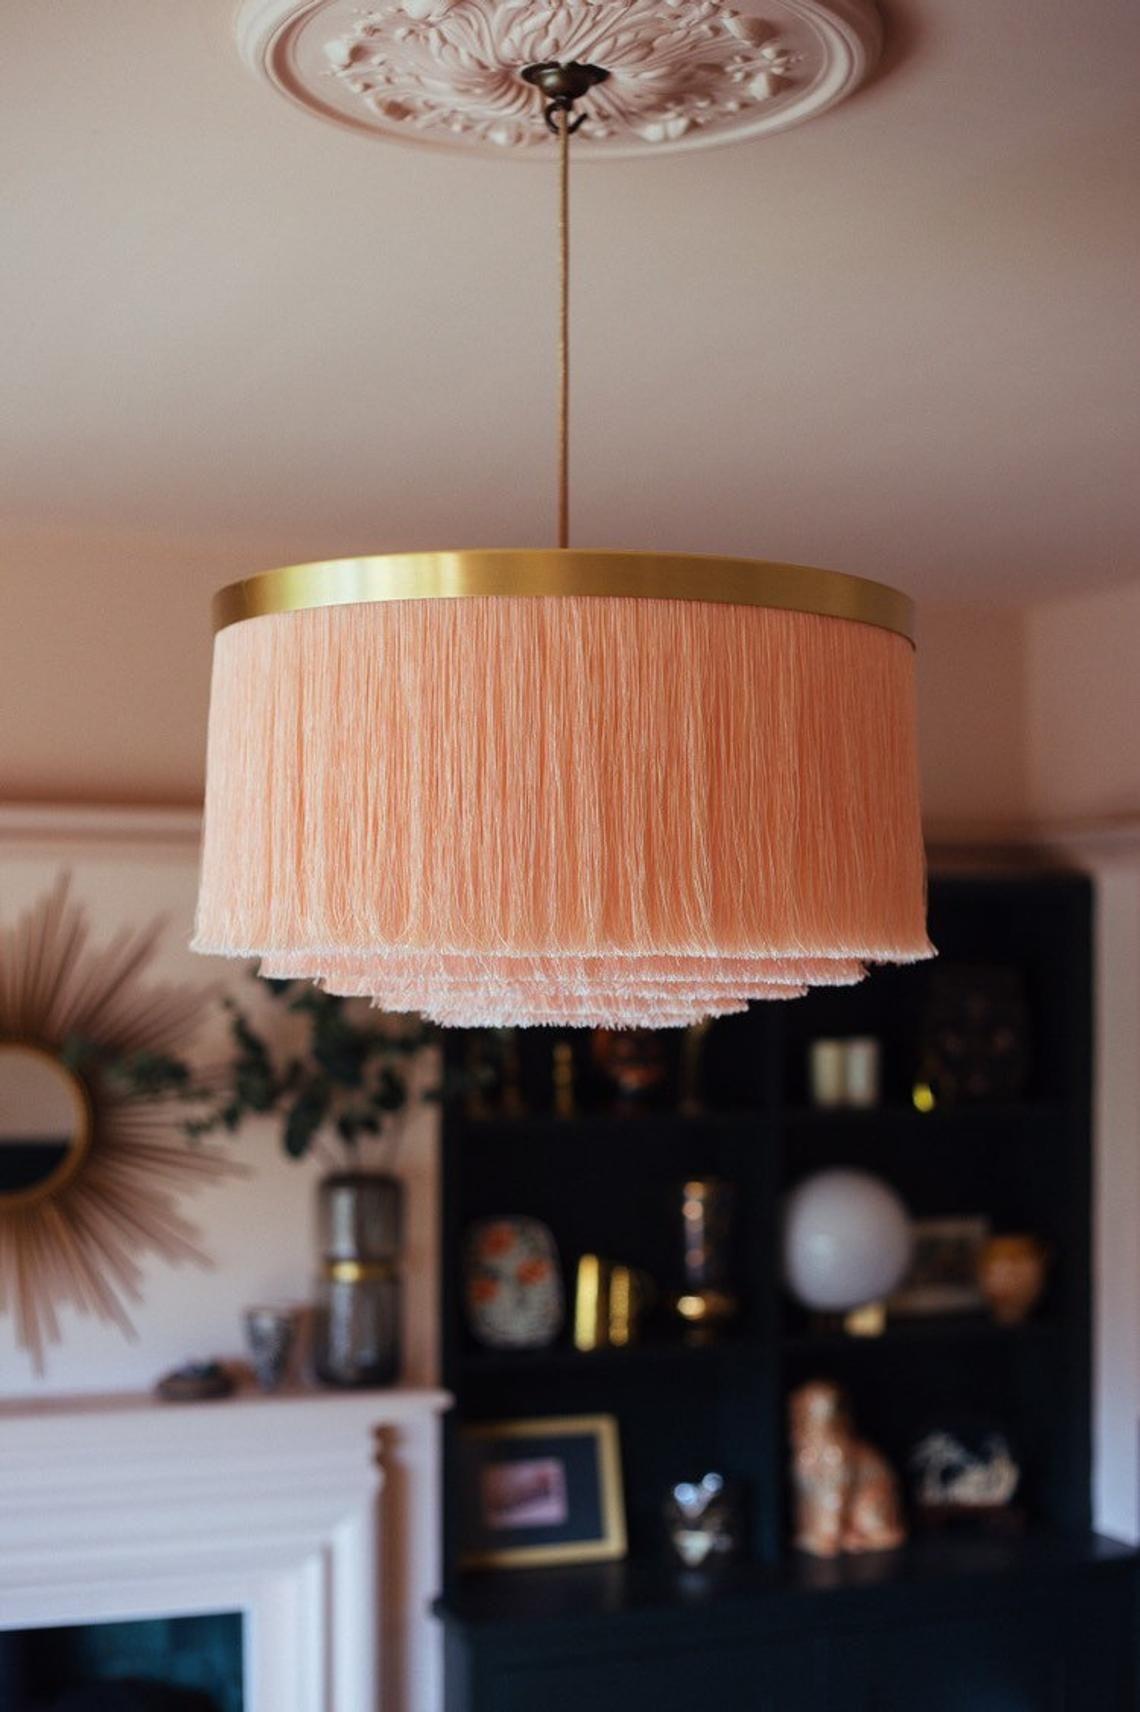 Fringe Light P I N K L E M O N A D E Lampshade In Softest Shell